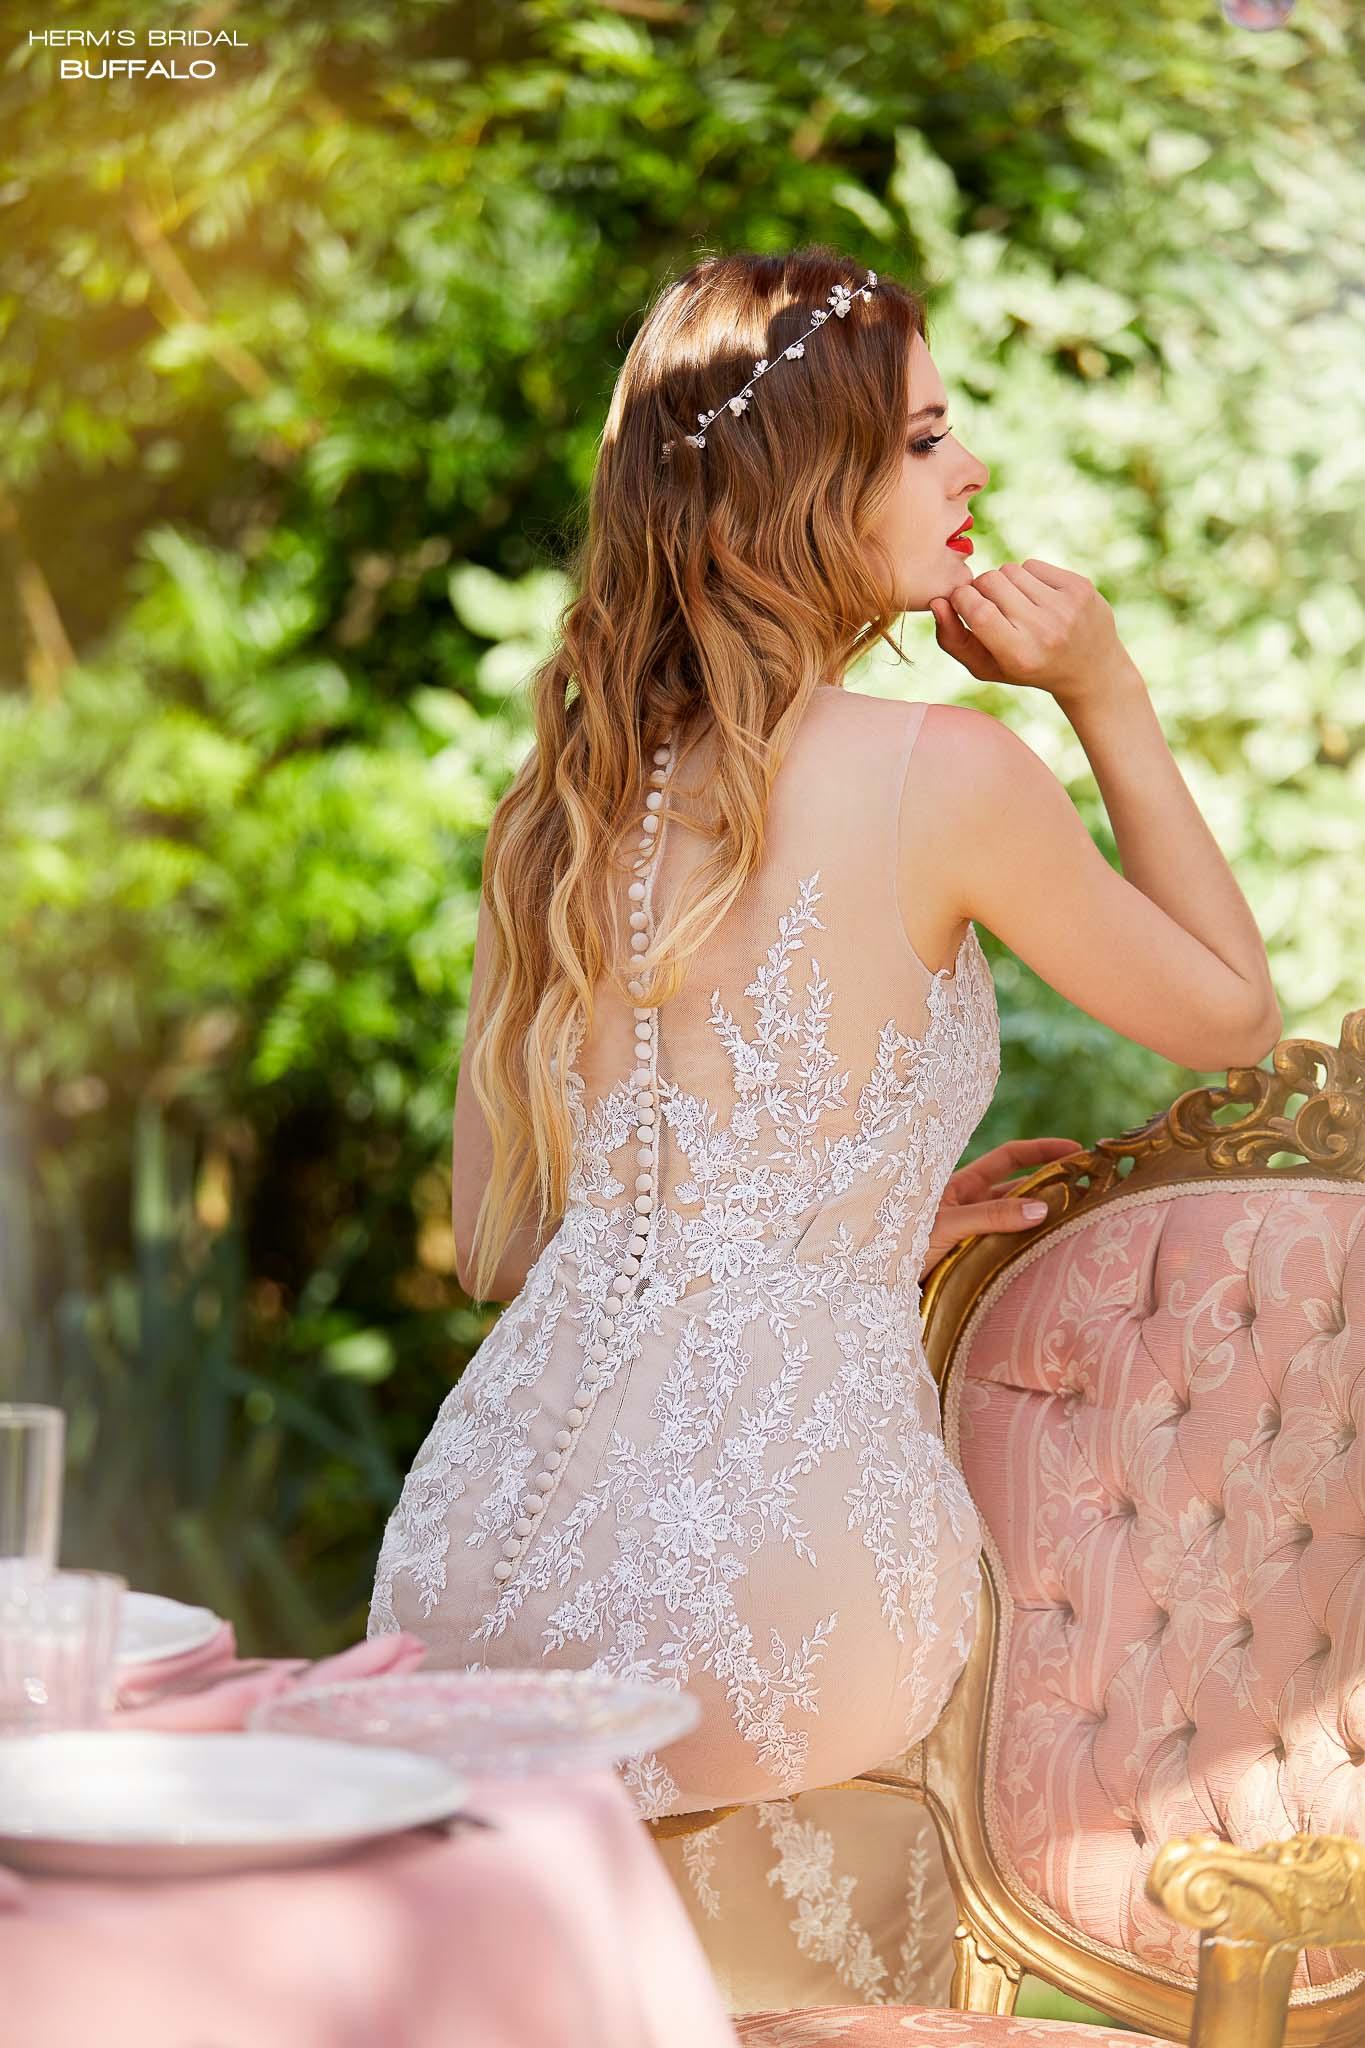 wedding dress Herm's Bridal Buffalo